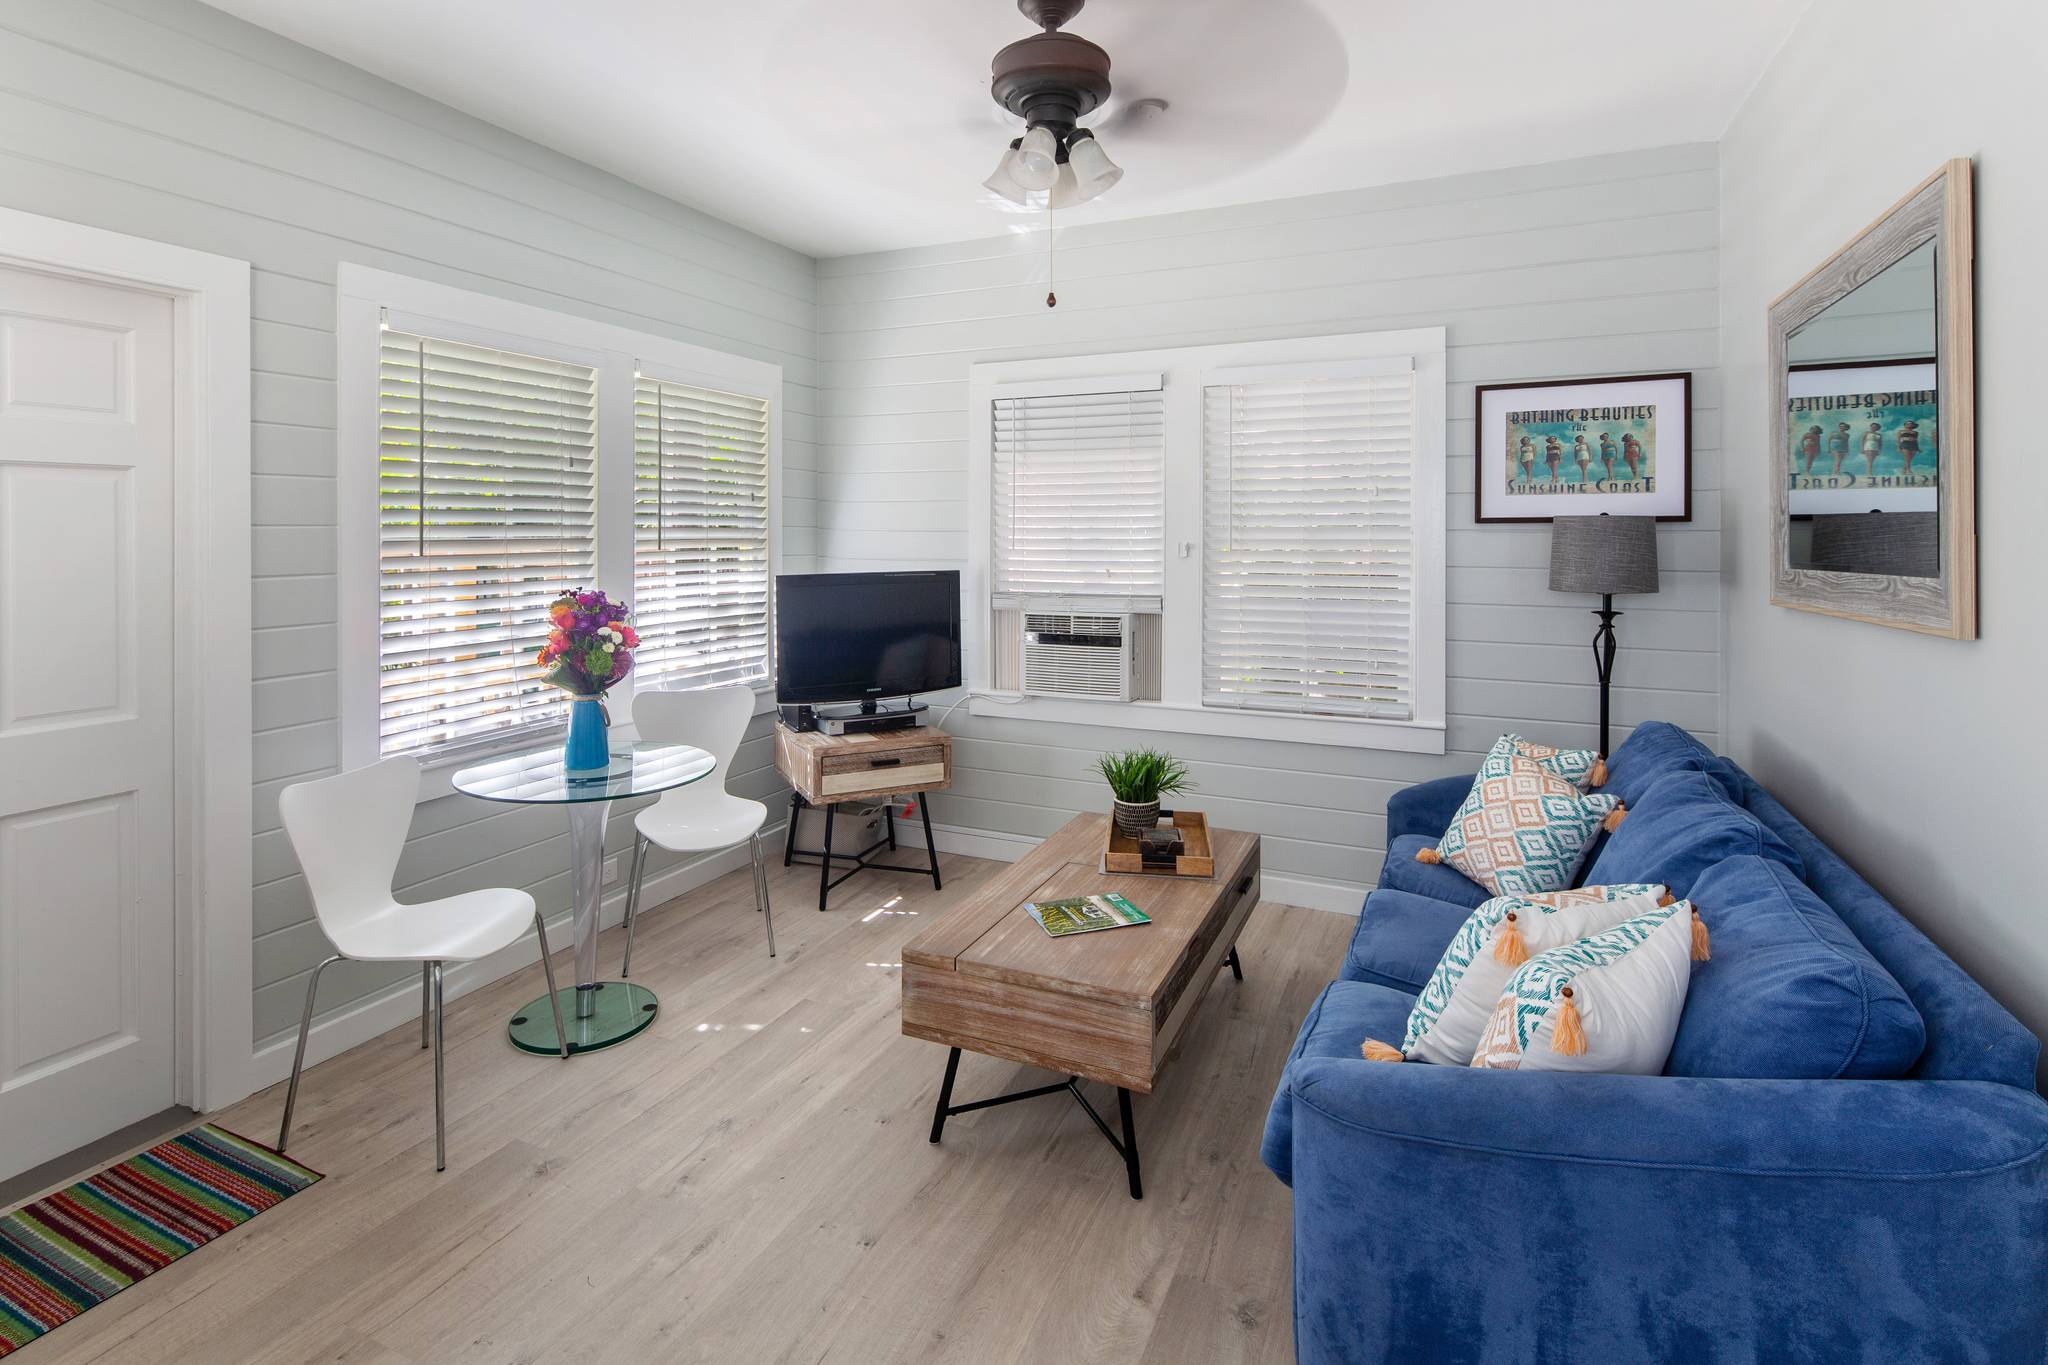 Poinciana Garden Nightly Rental Historic Key West Vacation Rentals